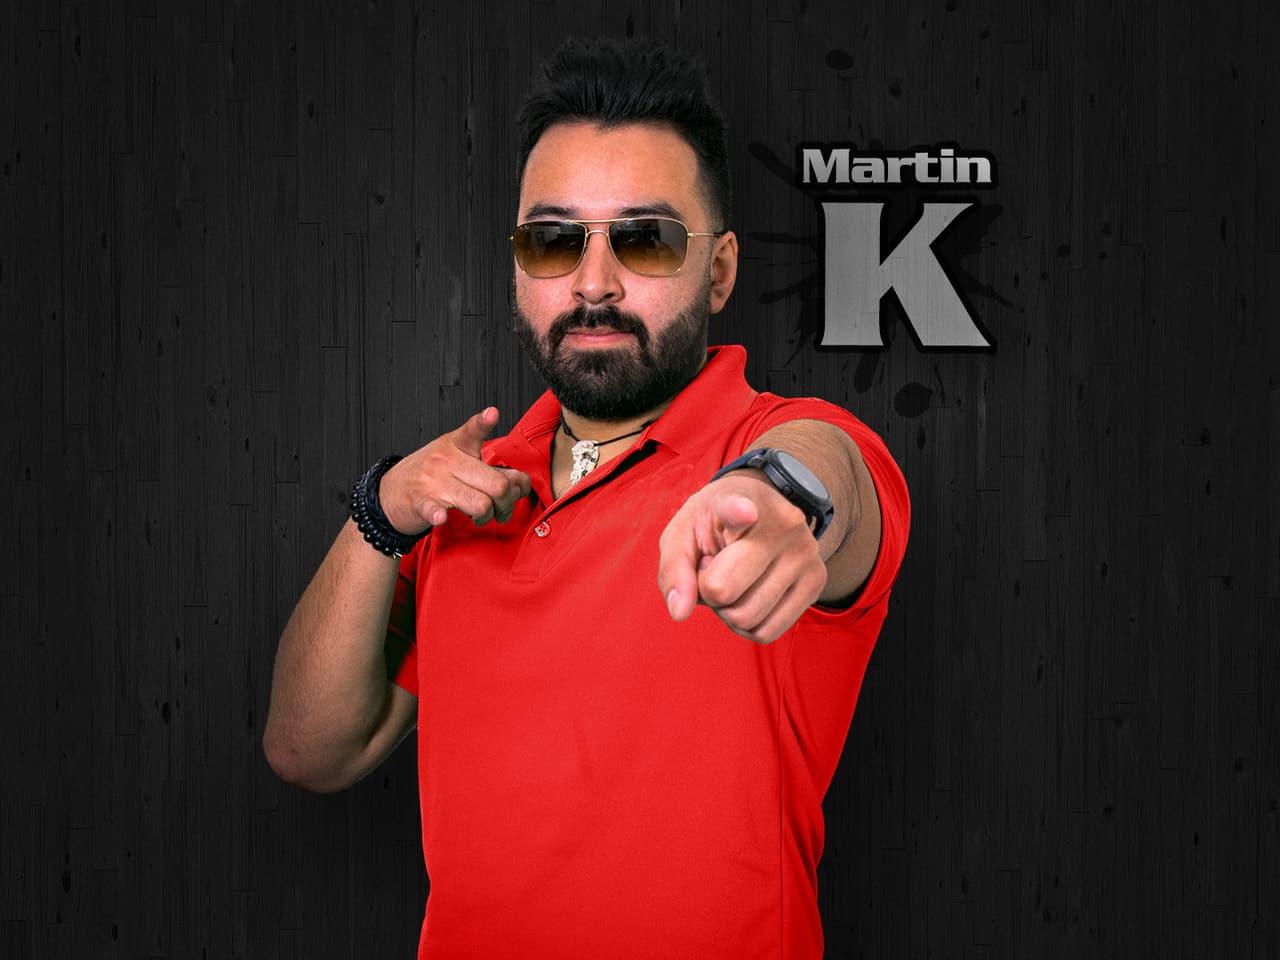 Martin K 2